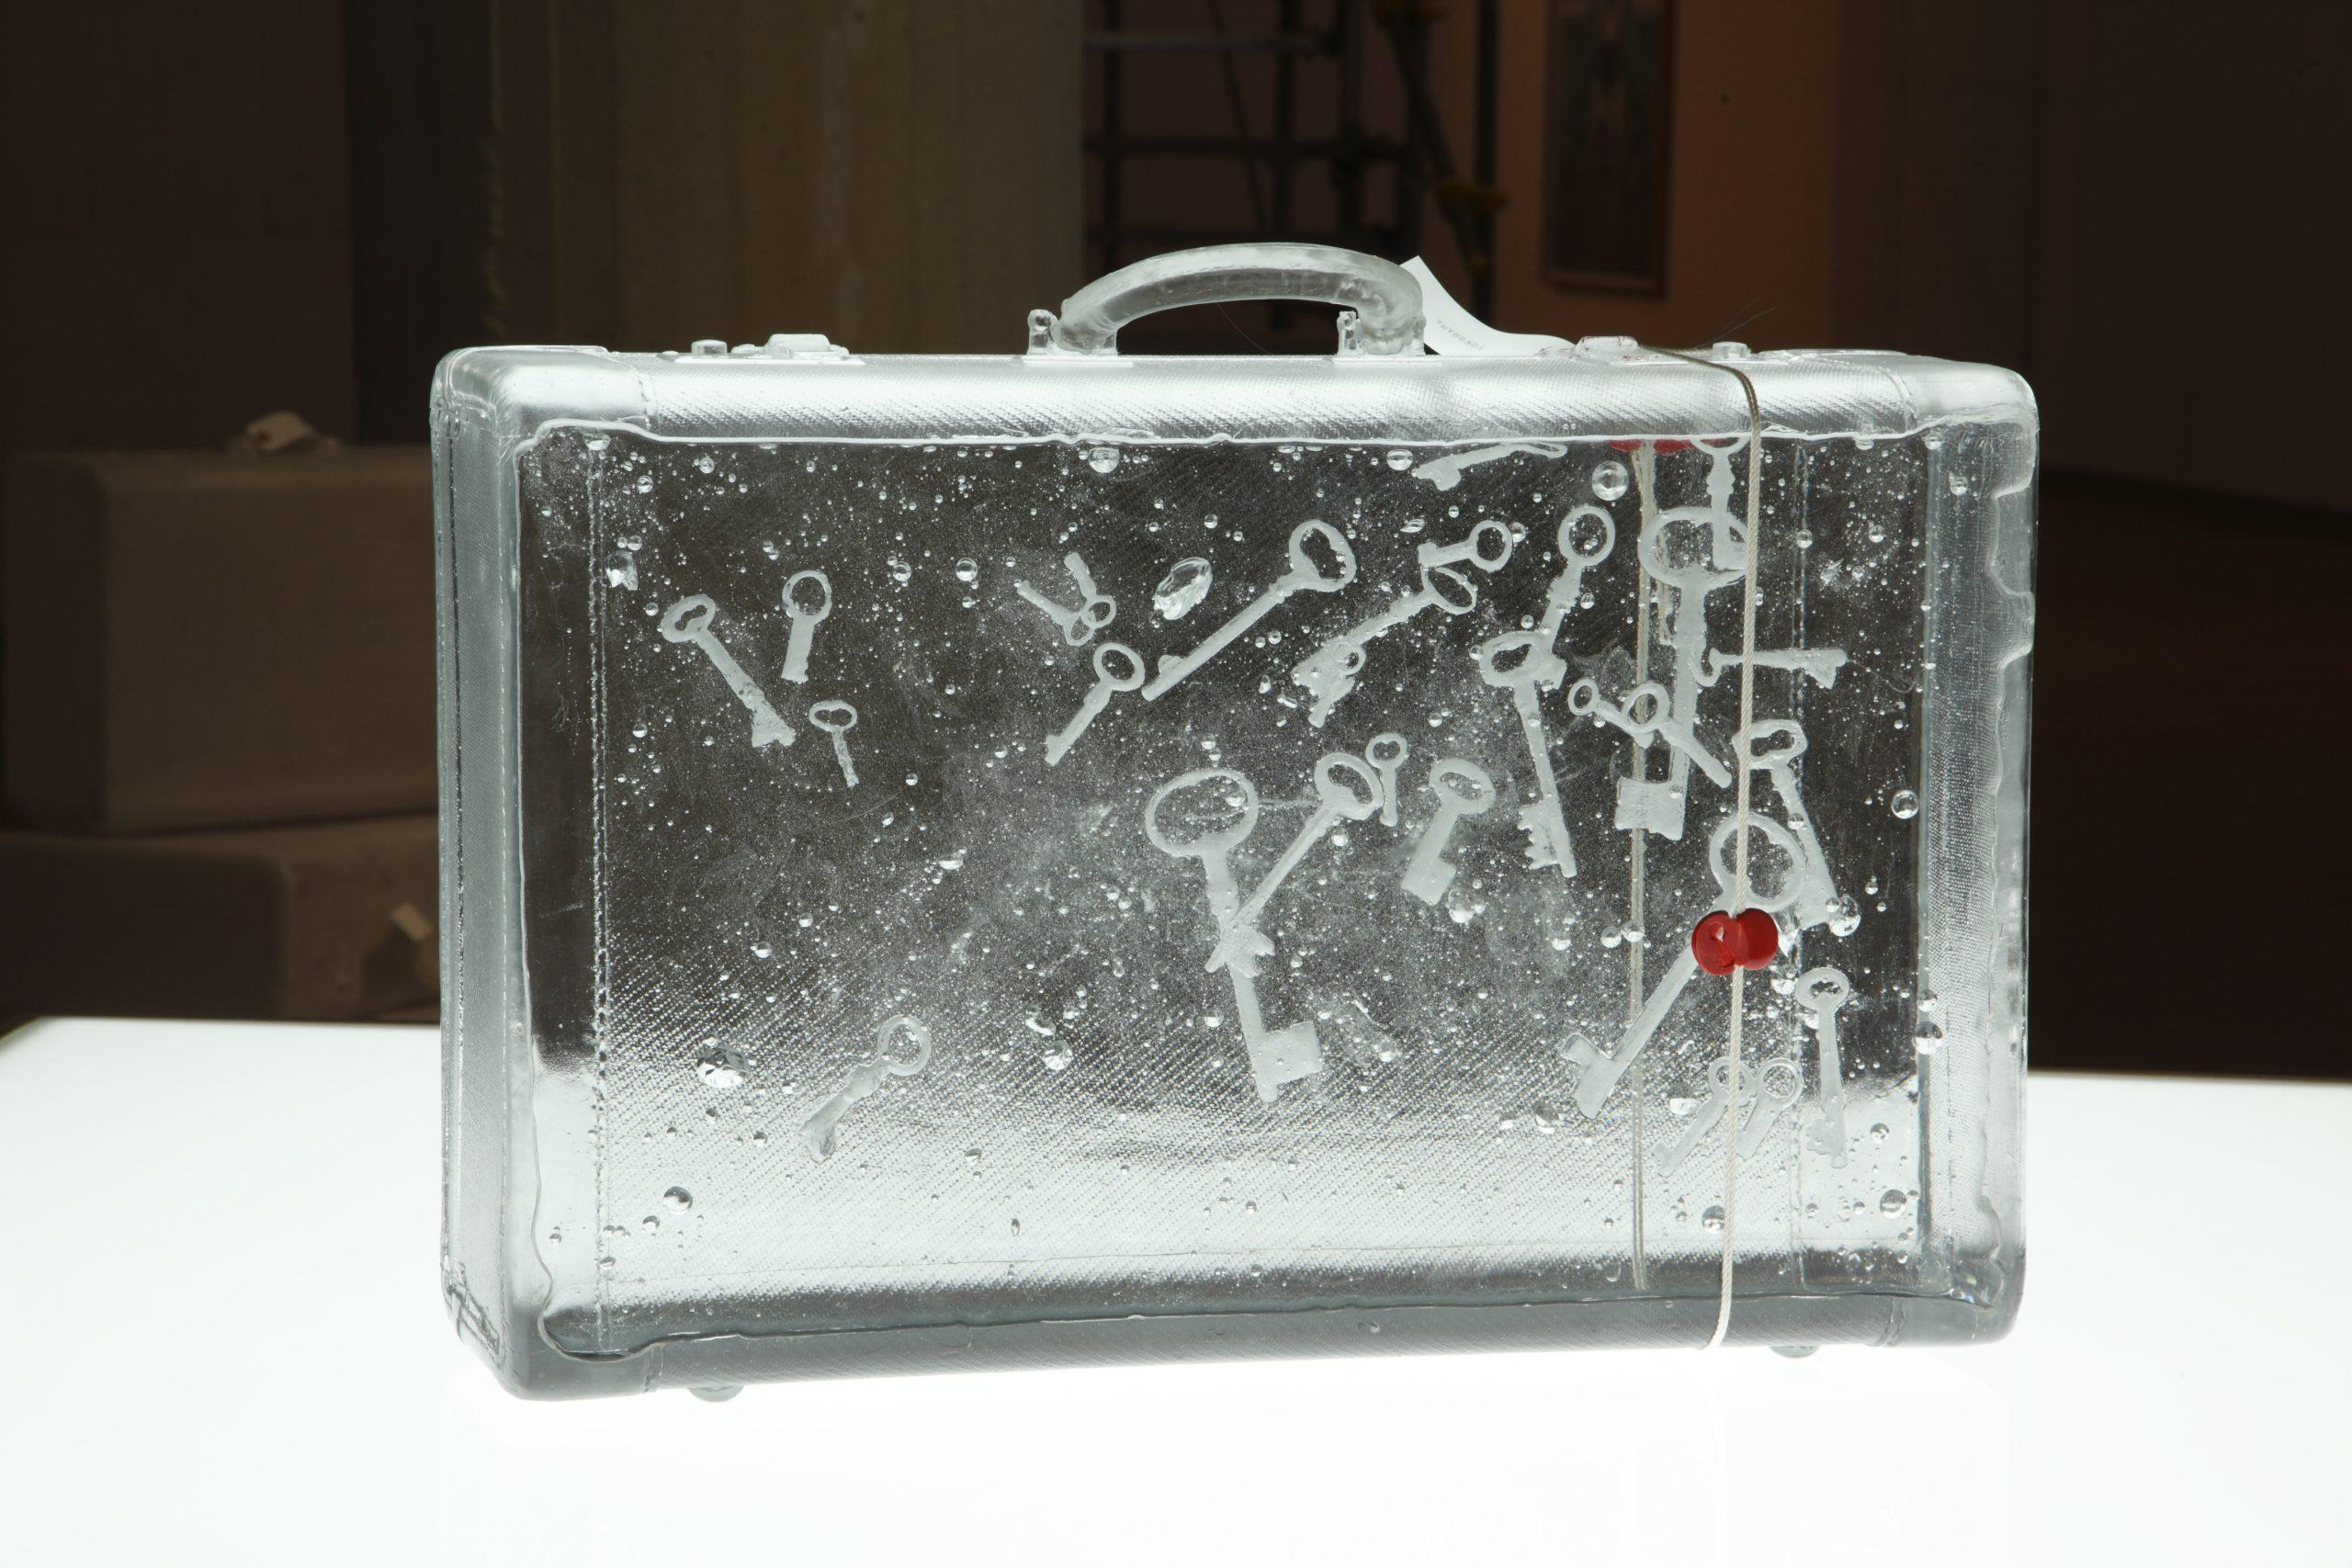 Aiko Miyanaga 《suitcase -key-》2013 Photo by Kazuo Kioku